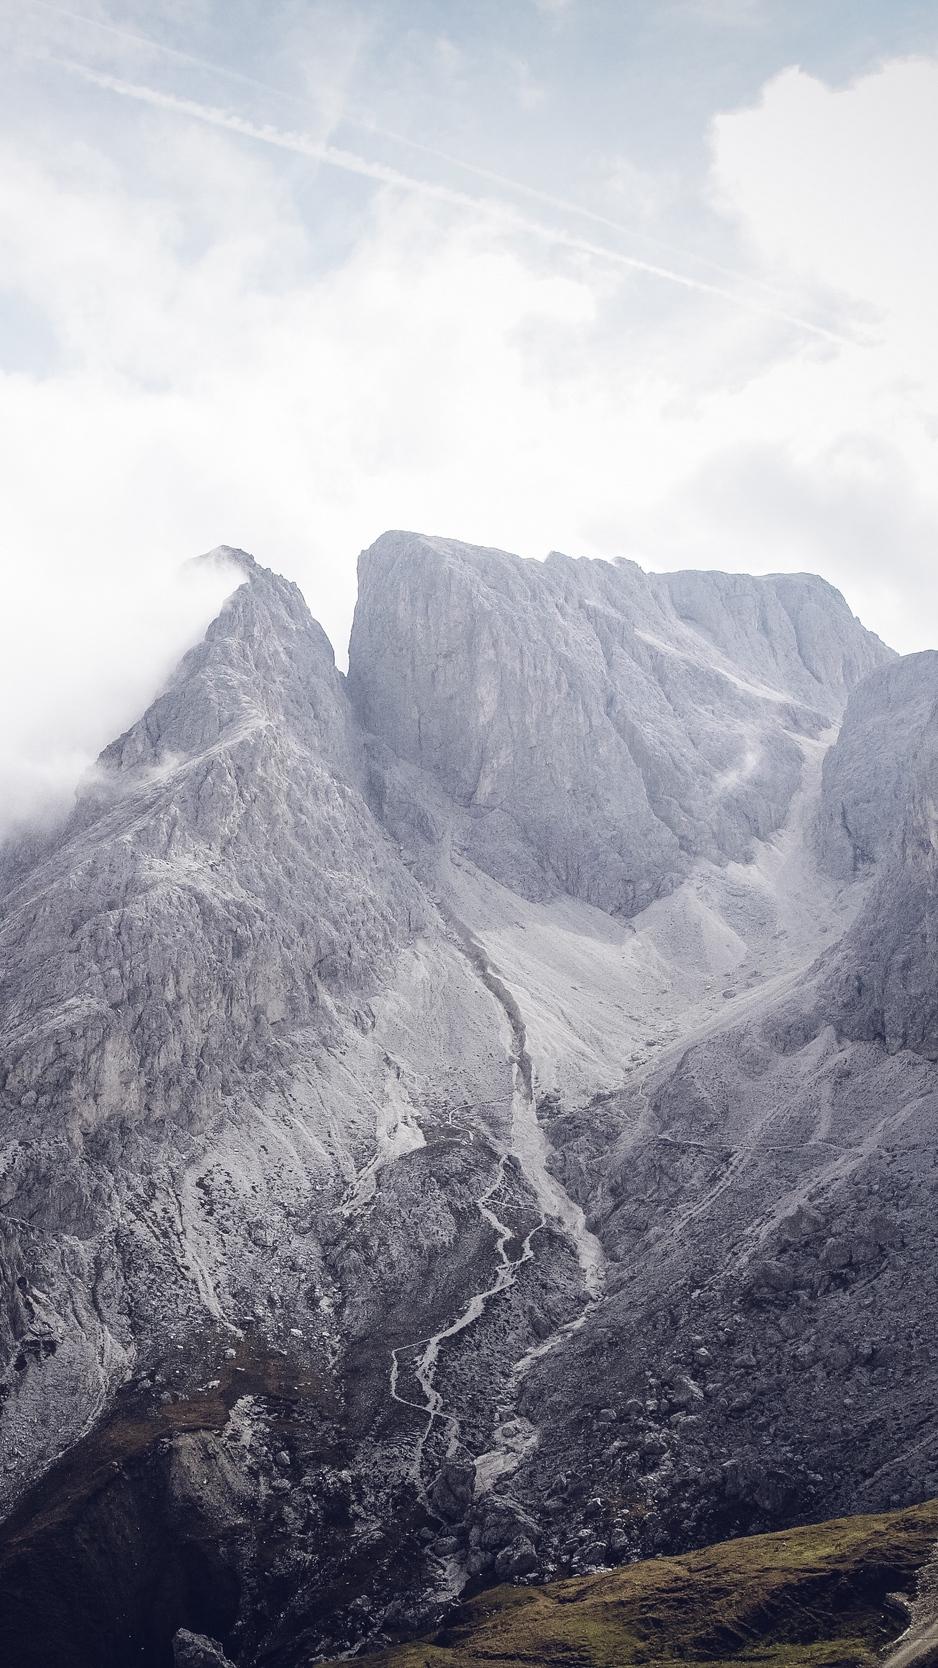 Download wallpaper 938x1668 south tyrol bolzano mountains 938x1668